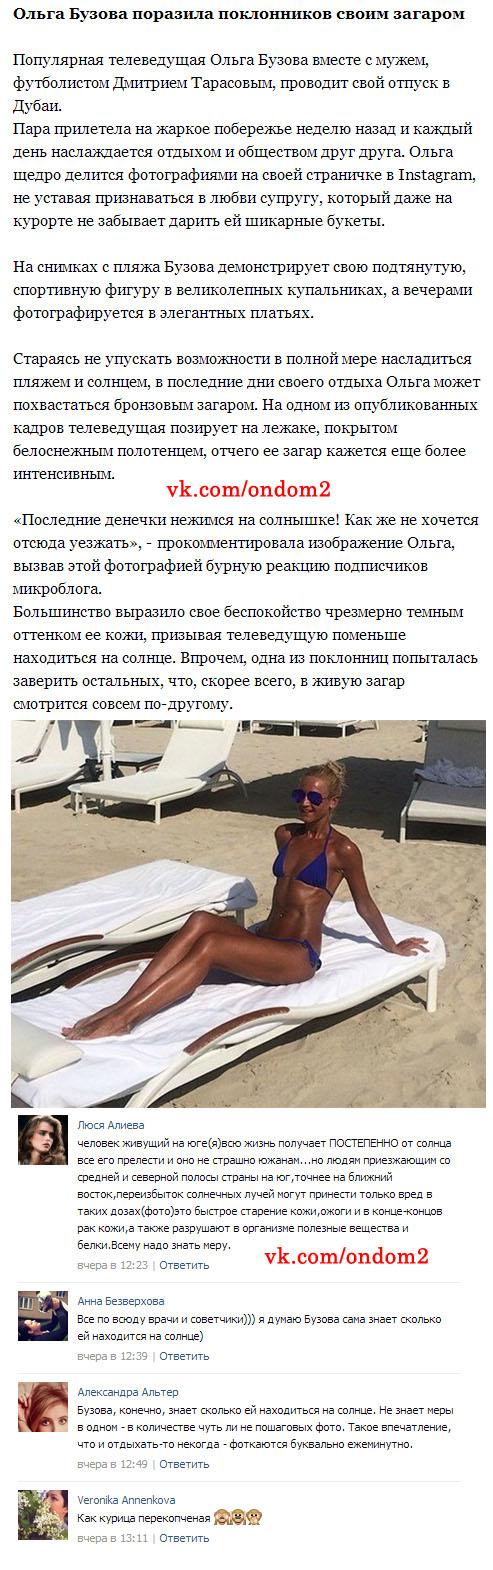 Ольга Бузова на пляжах в Дубаи